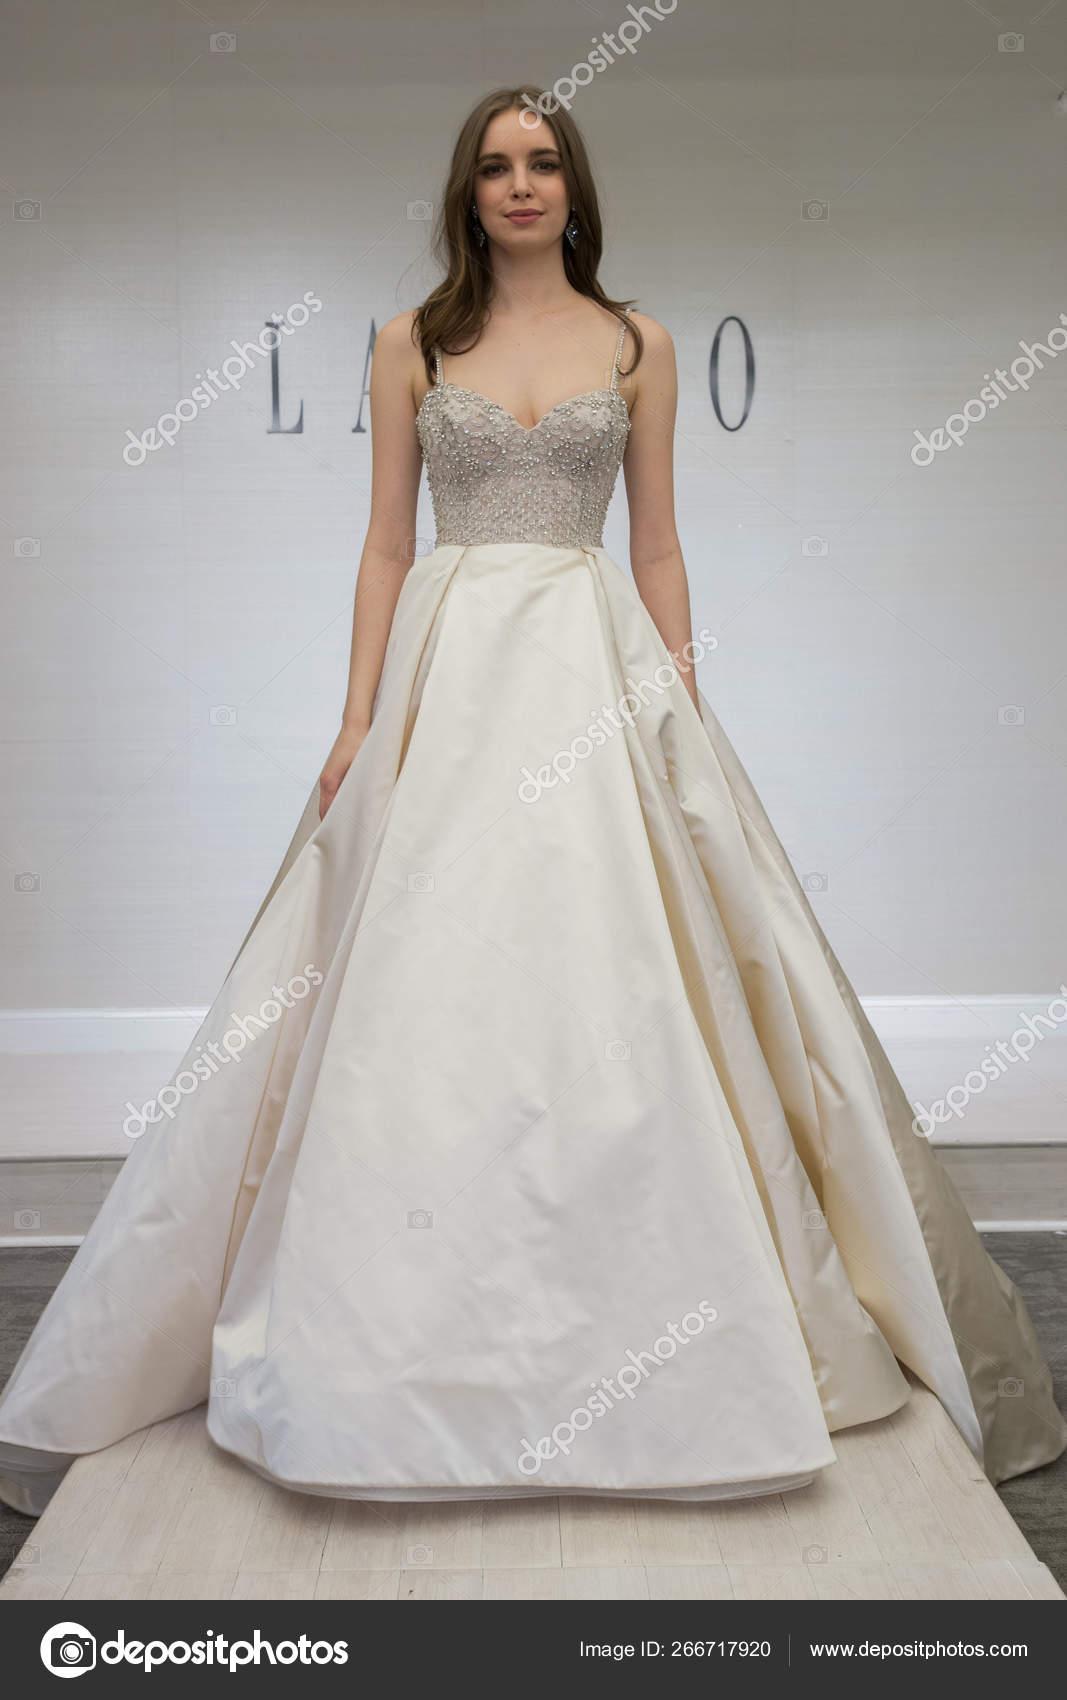 9b9a2b93e5a New York April Model Posing Lazaro Spring 2020 Bridal Fashion — Stock Photo